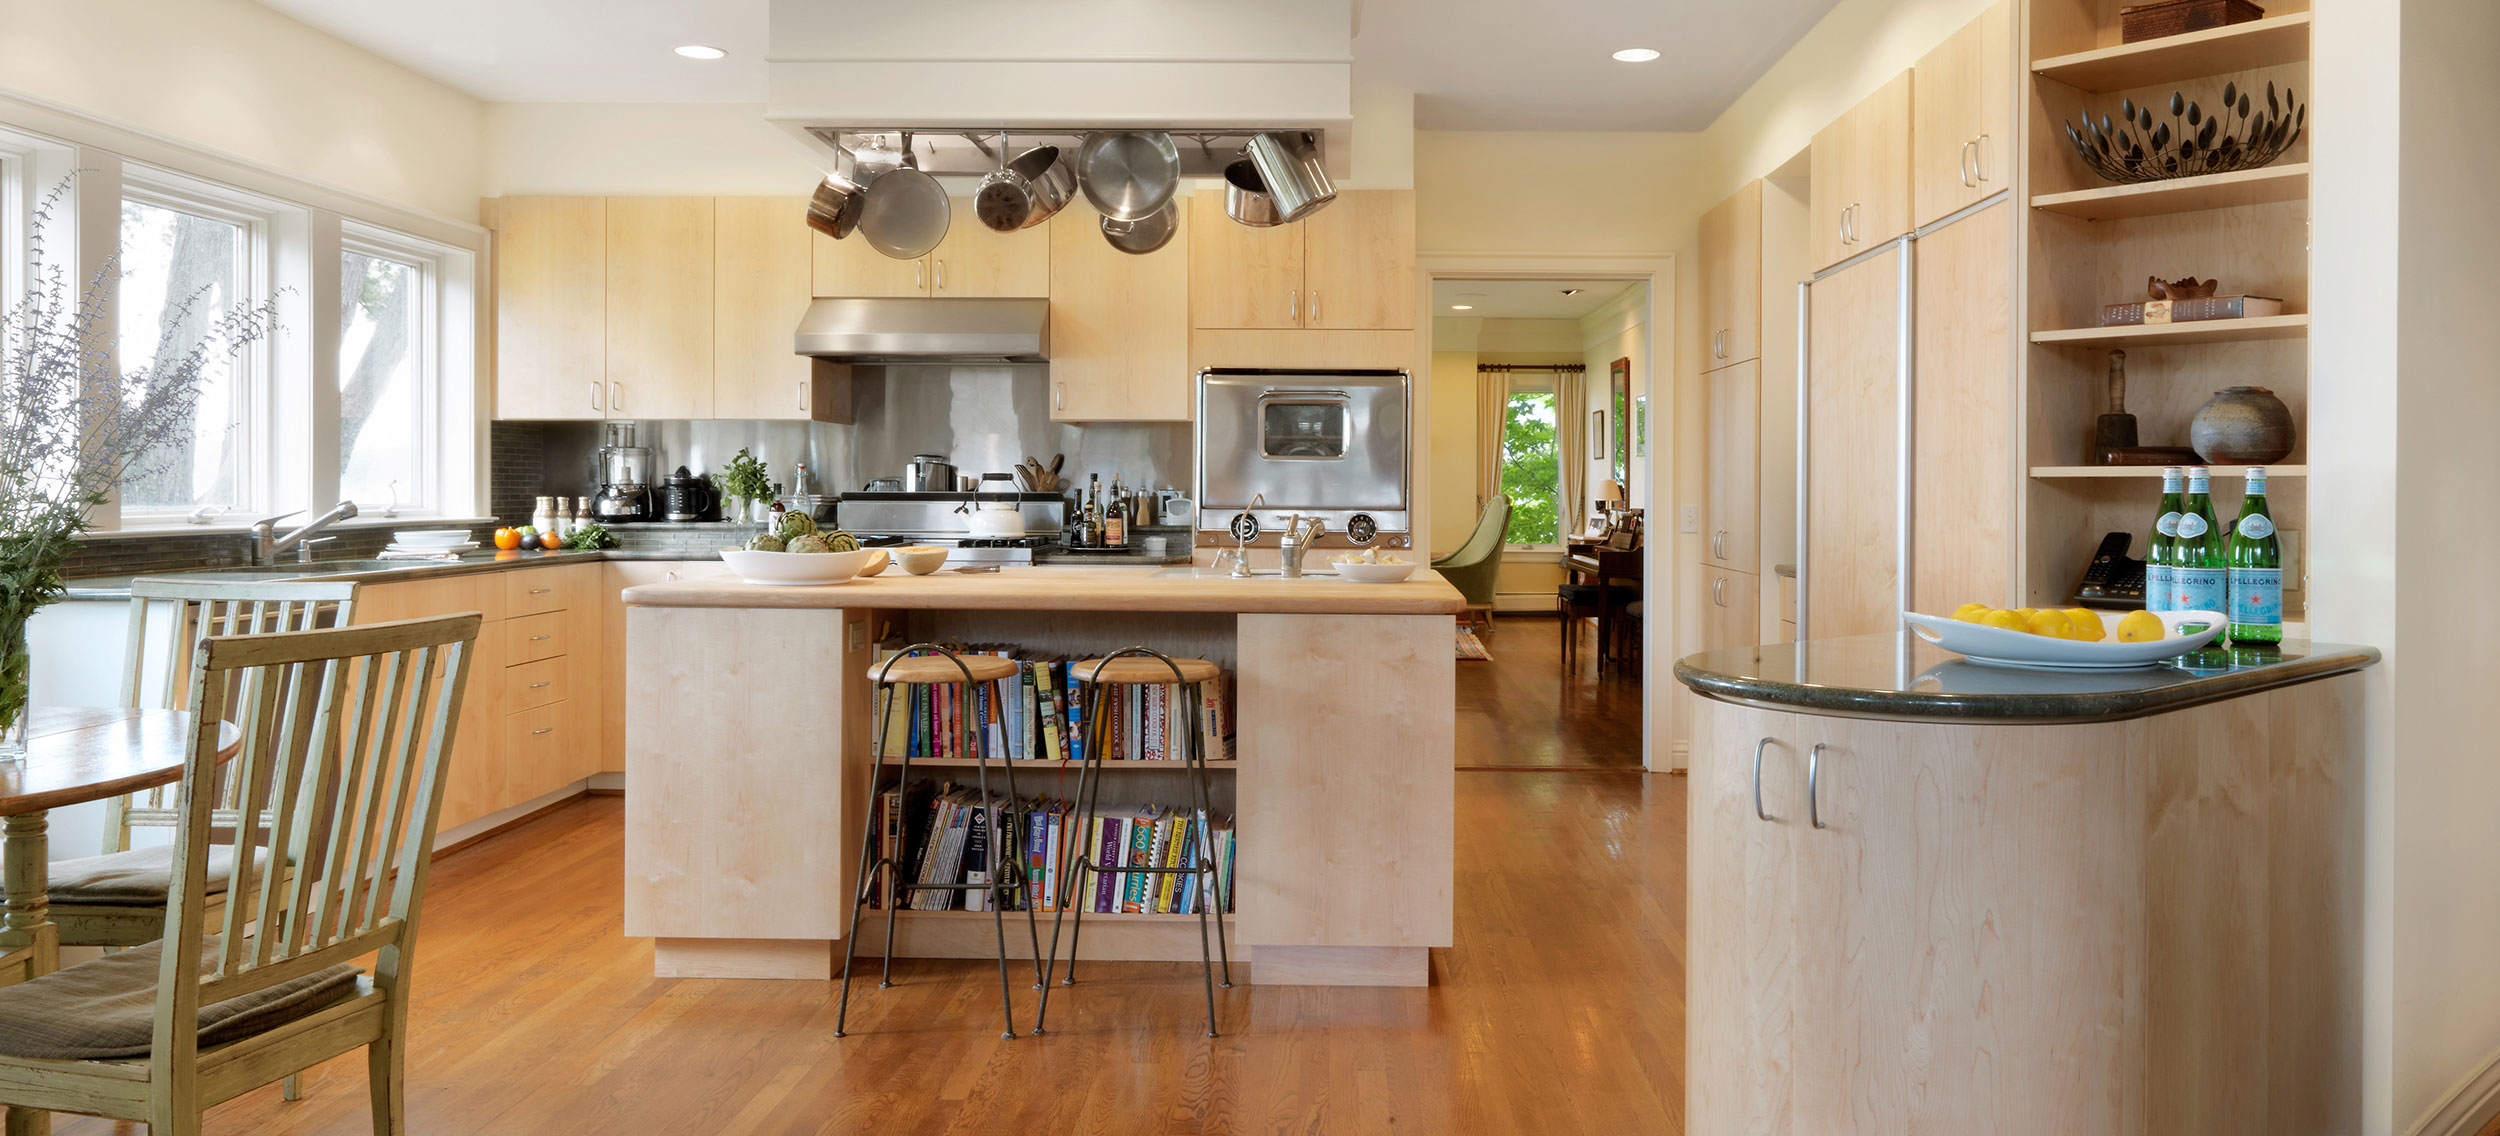 Contemporary-Maple-Slab-Kitchen-Cabinets.jpg